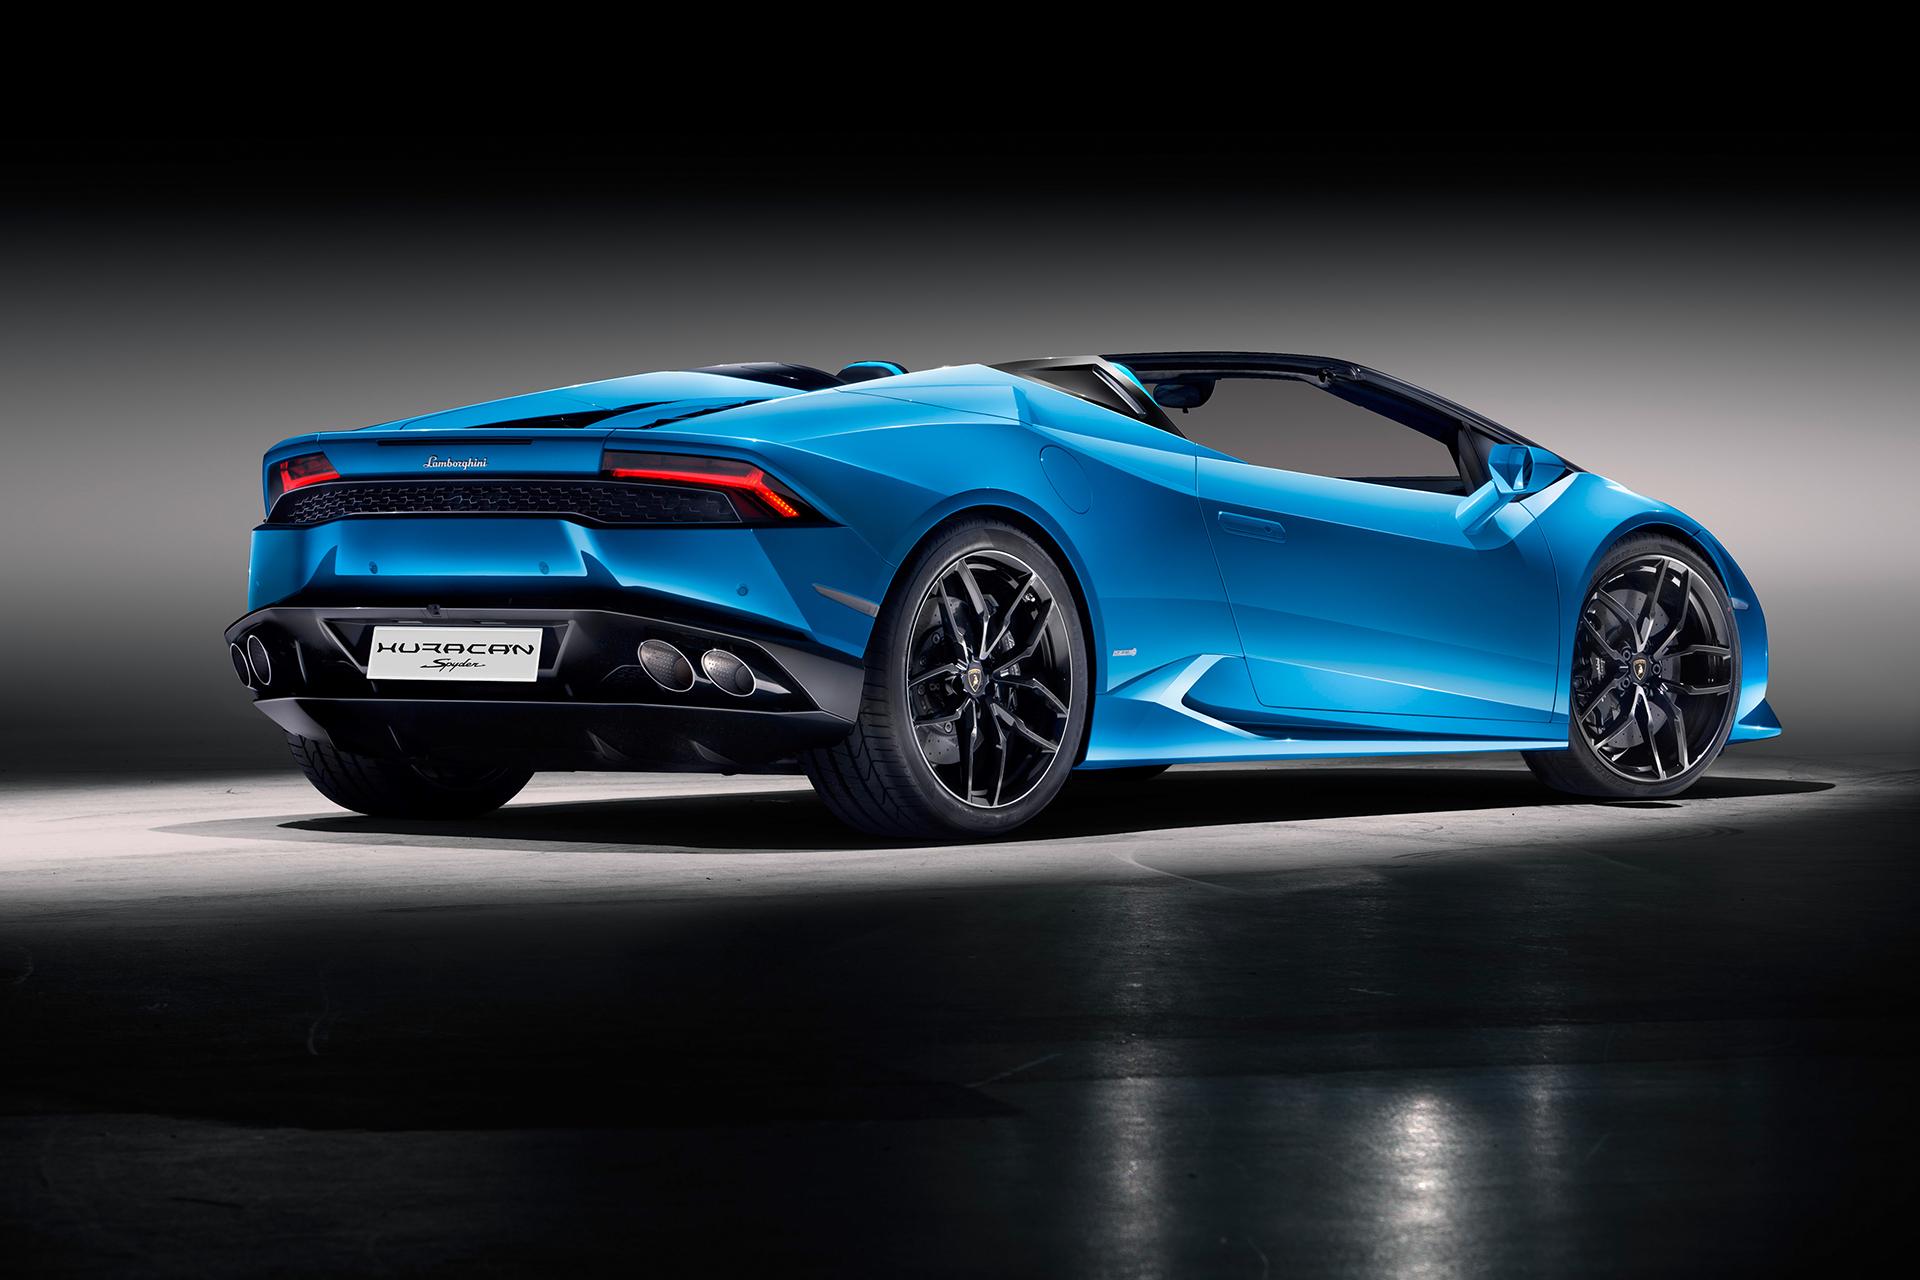 Lamborghini Huracán LP 610-4 Spyder - profil arrière / rear side-face